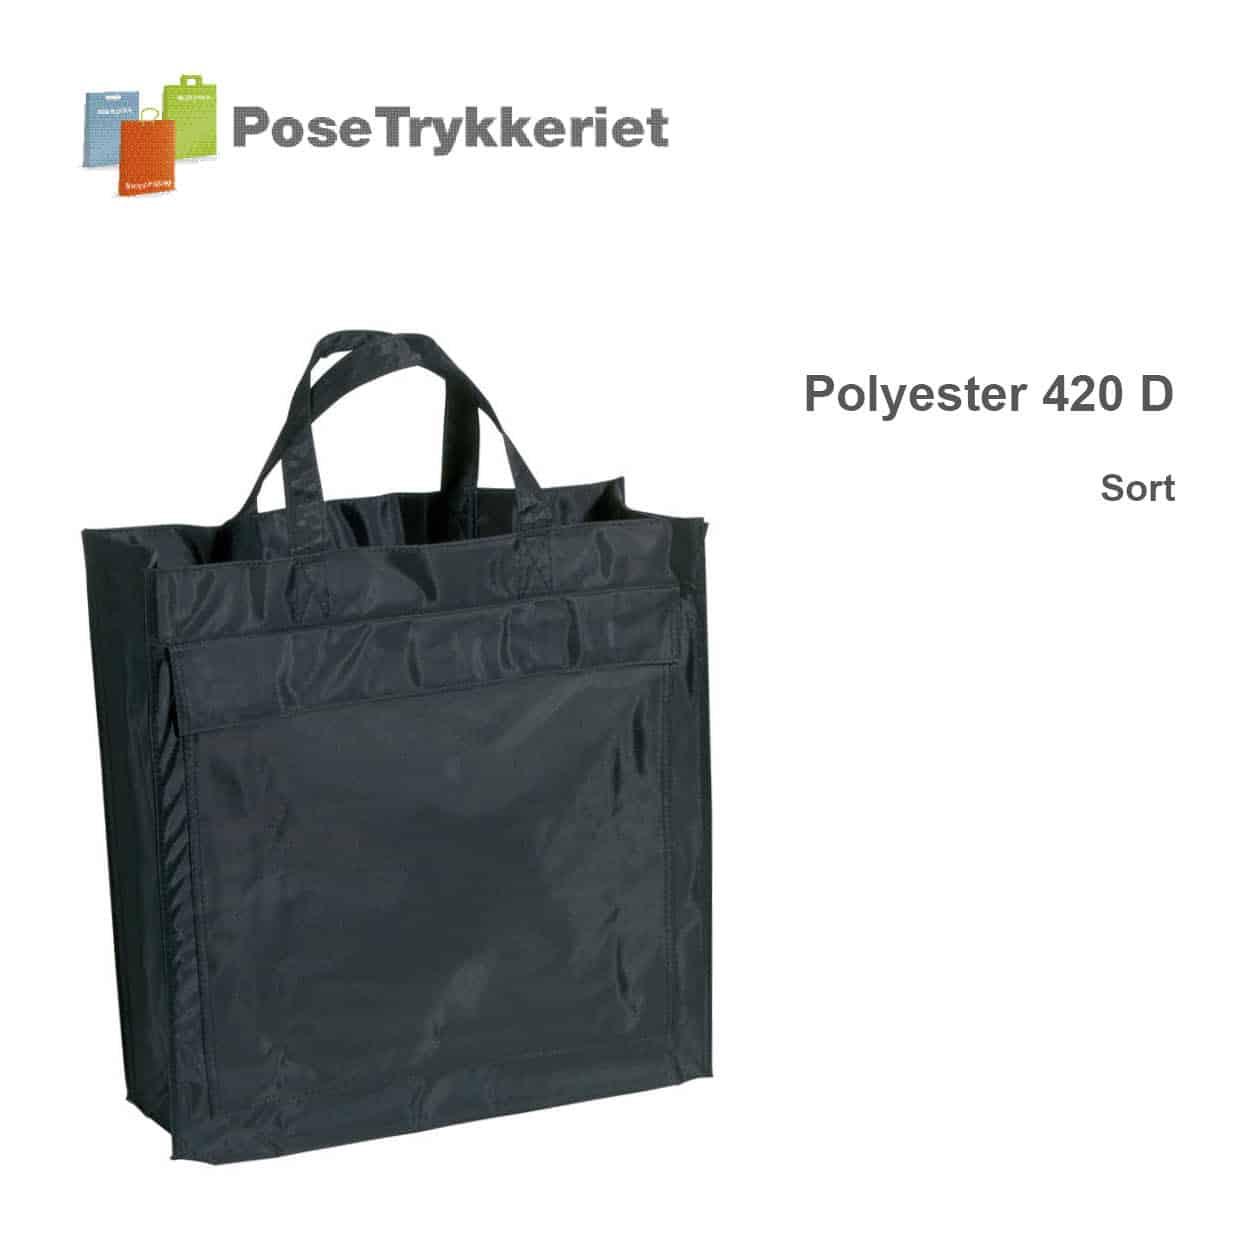 Sort revisorpose 420 D, PoseTrykkeriet.dk